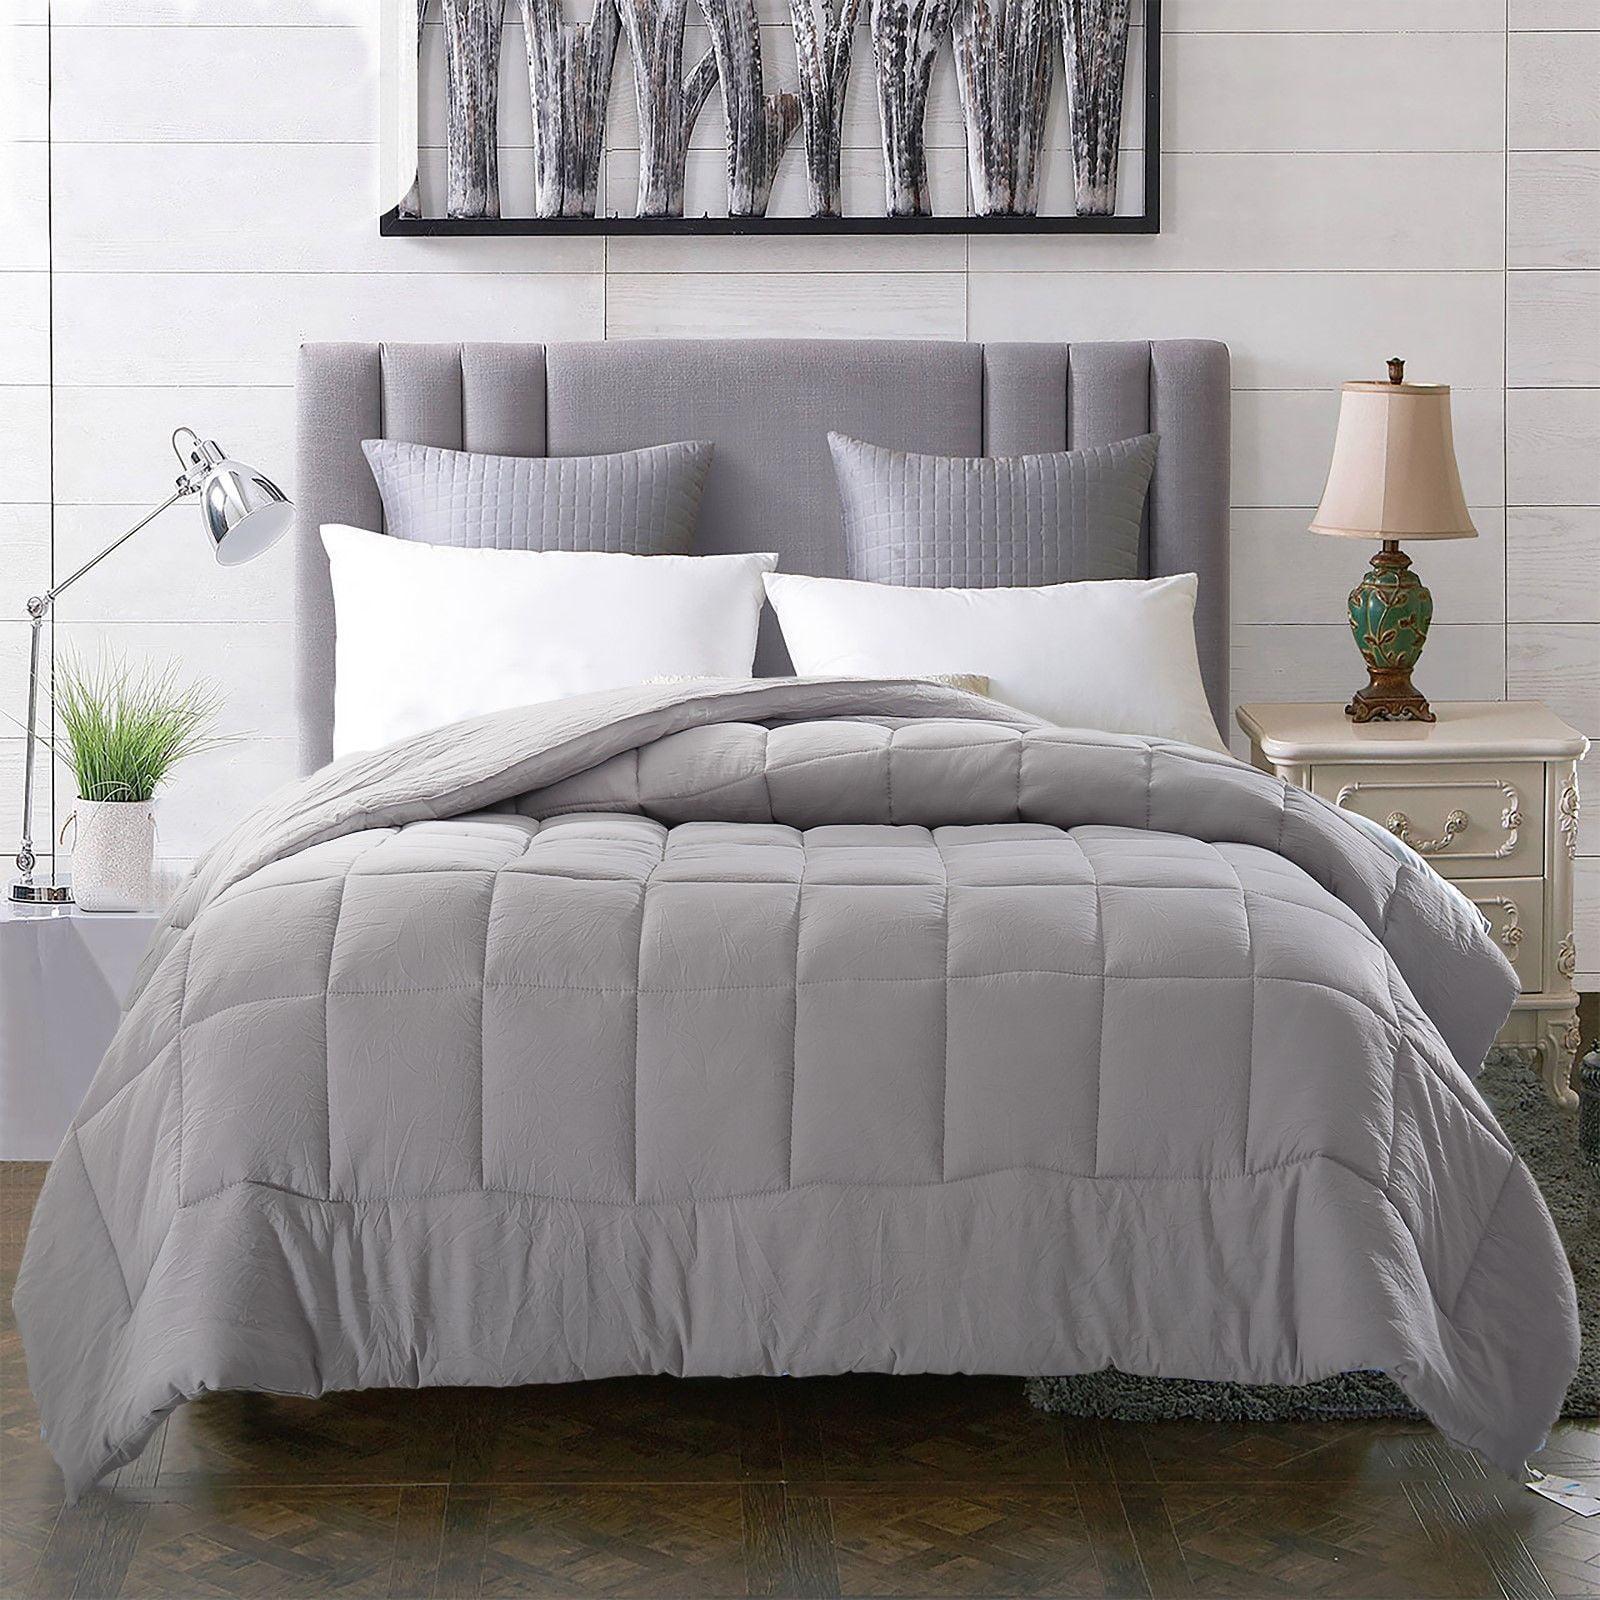 Evolive All Season PreWashed Microfiber White Goose Down Alternative Comforter